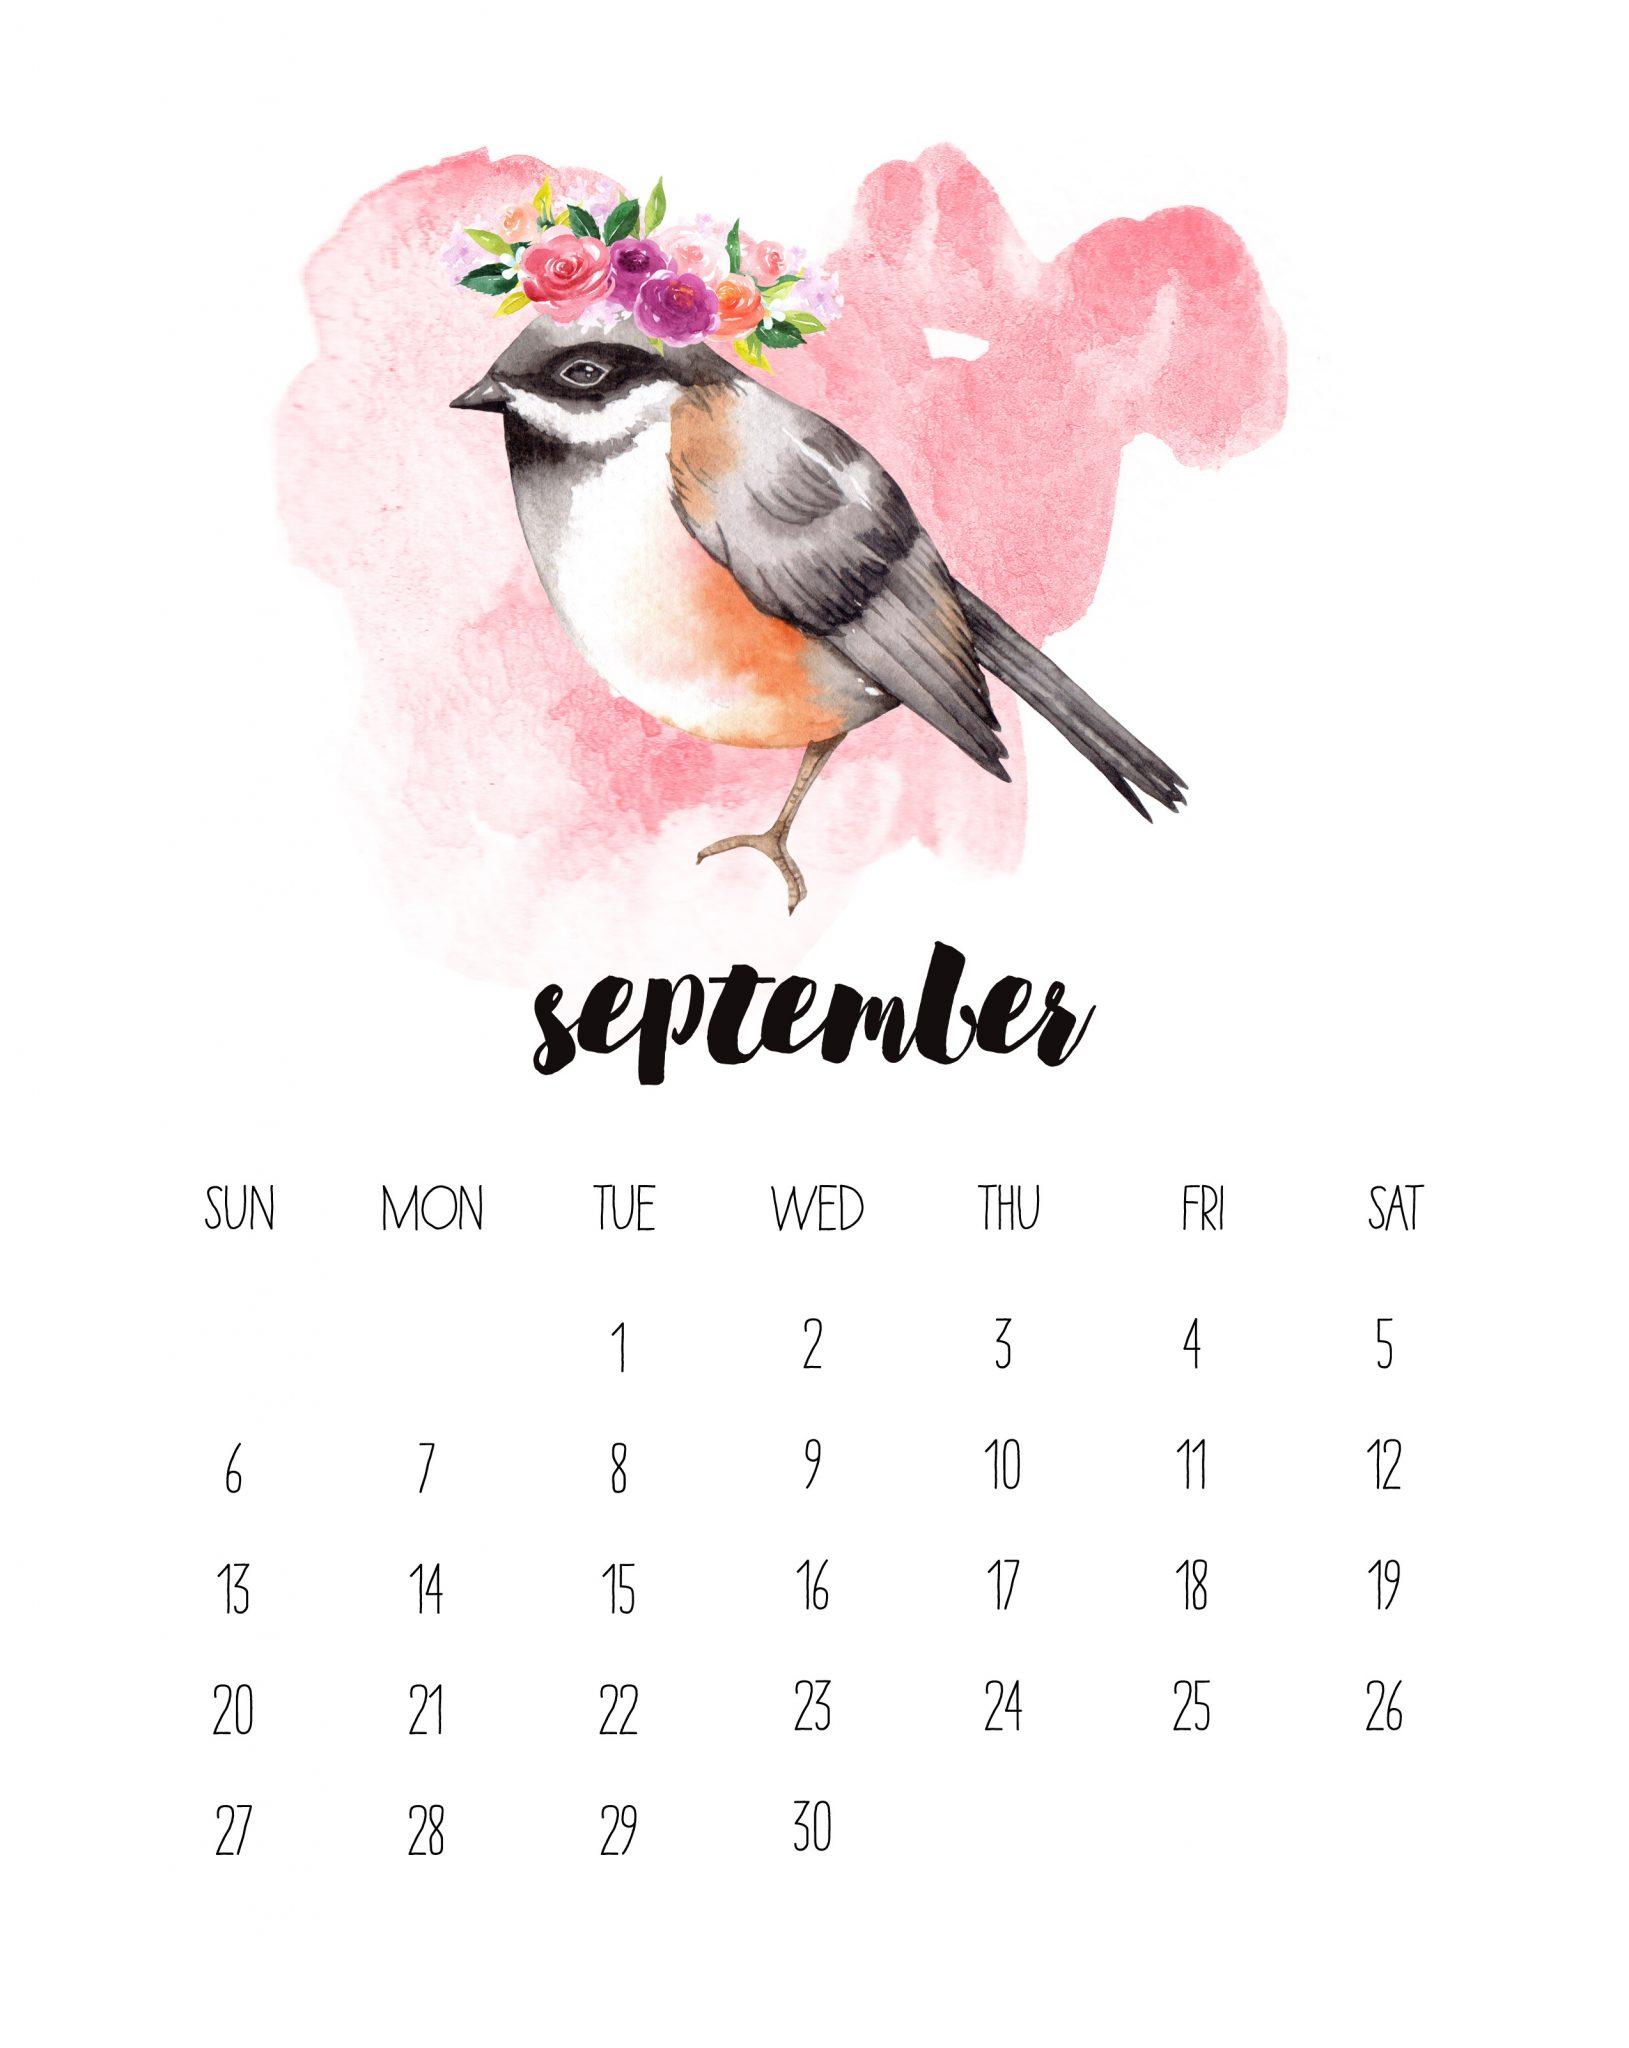 Watercolor Animal September 2020 Wall Calendar